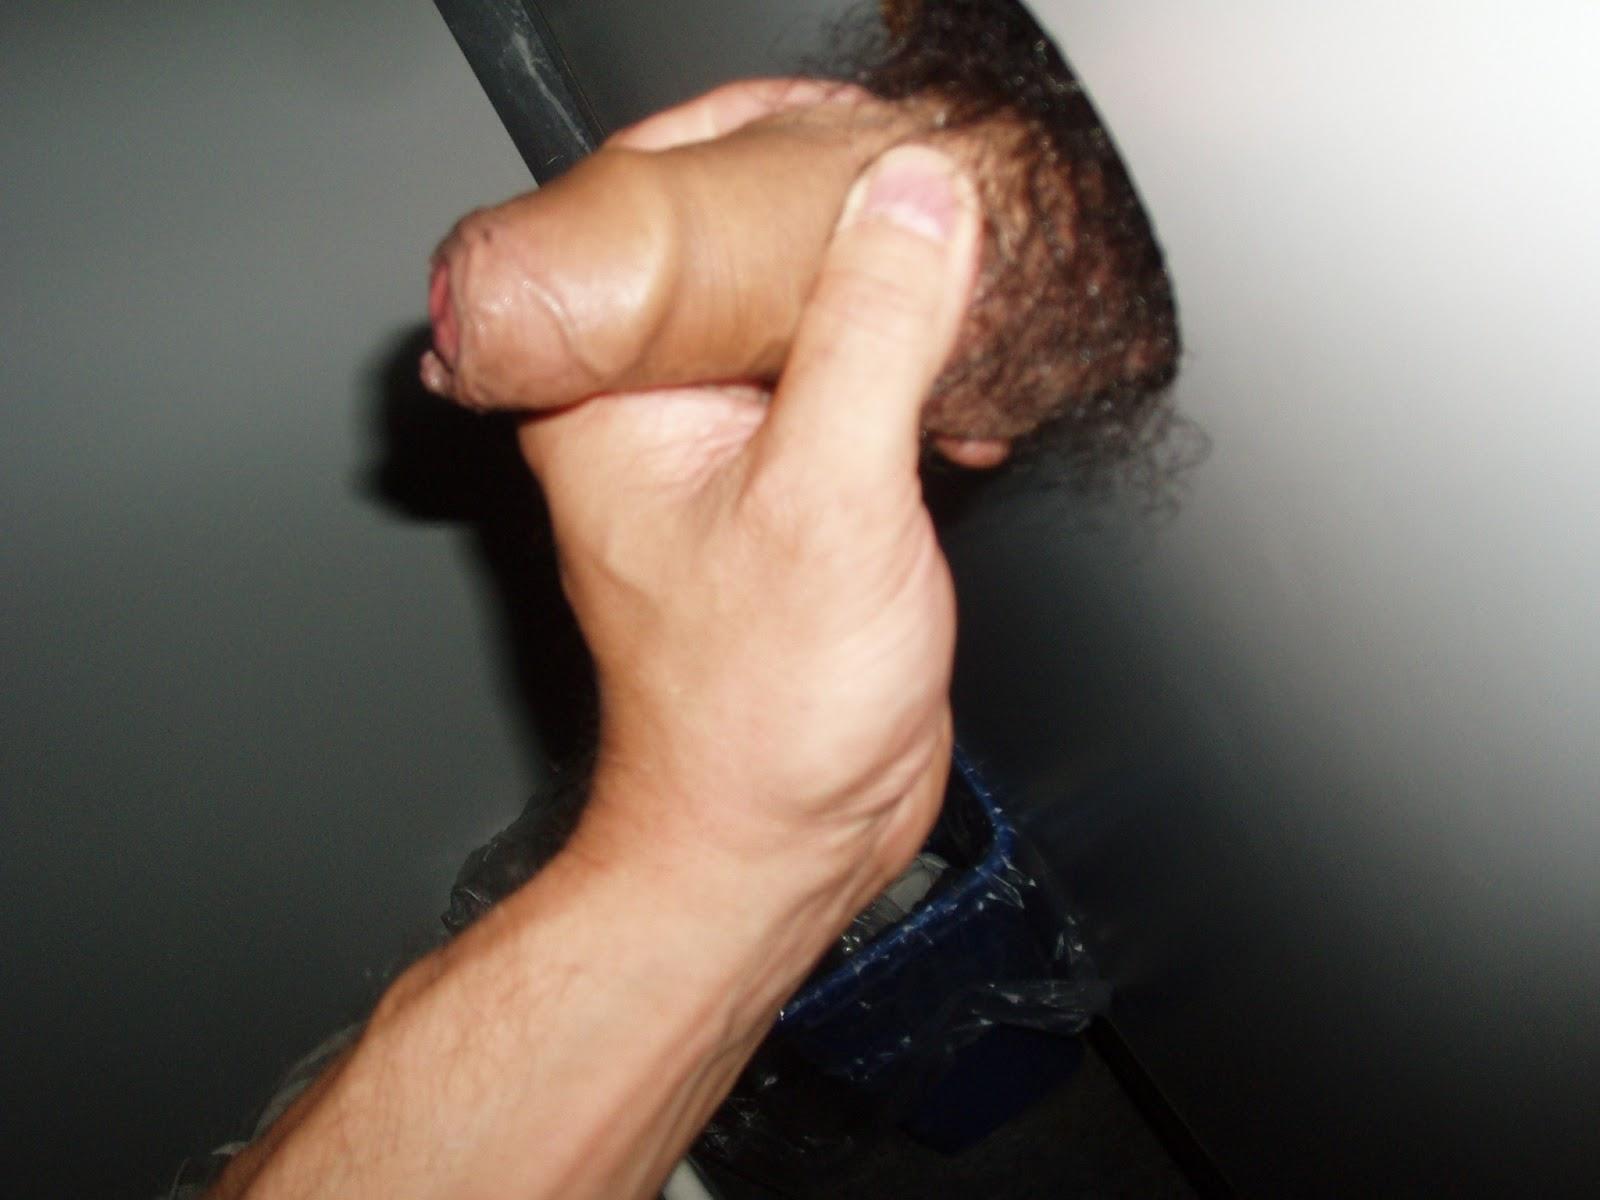 Sharing porn 1 girl many guys